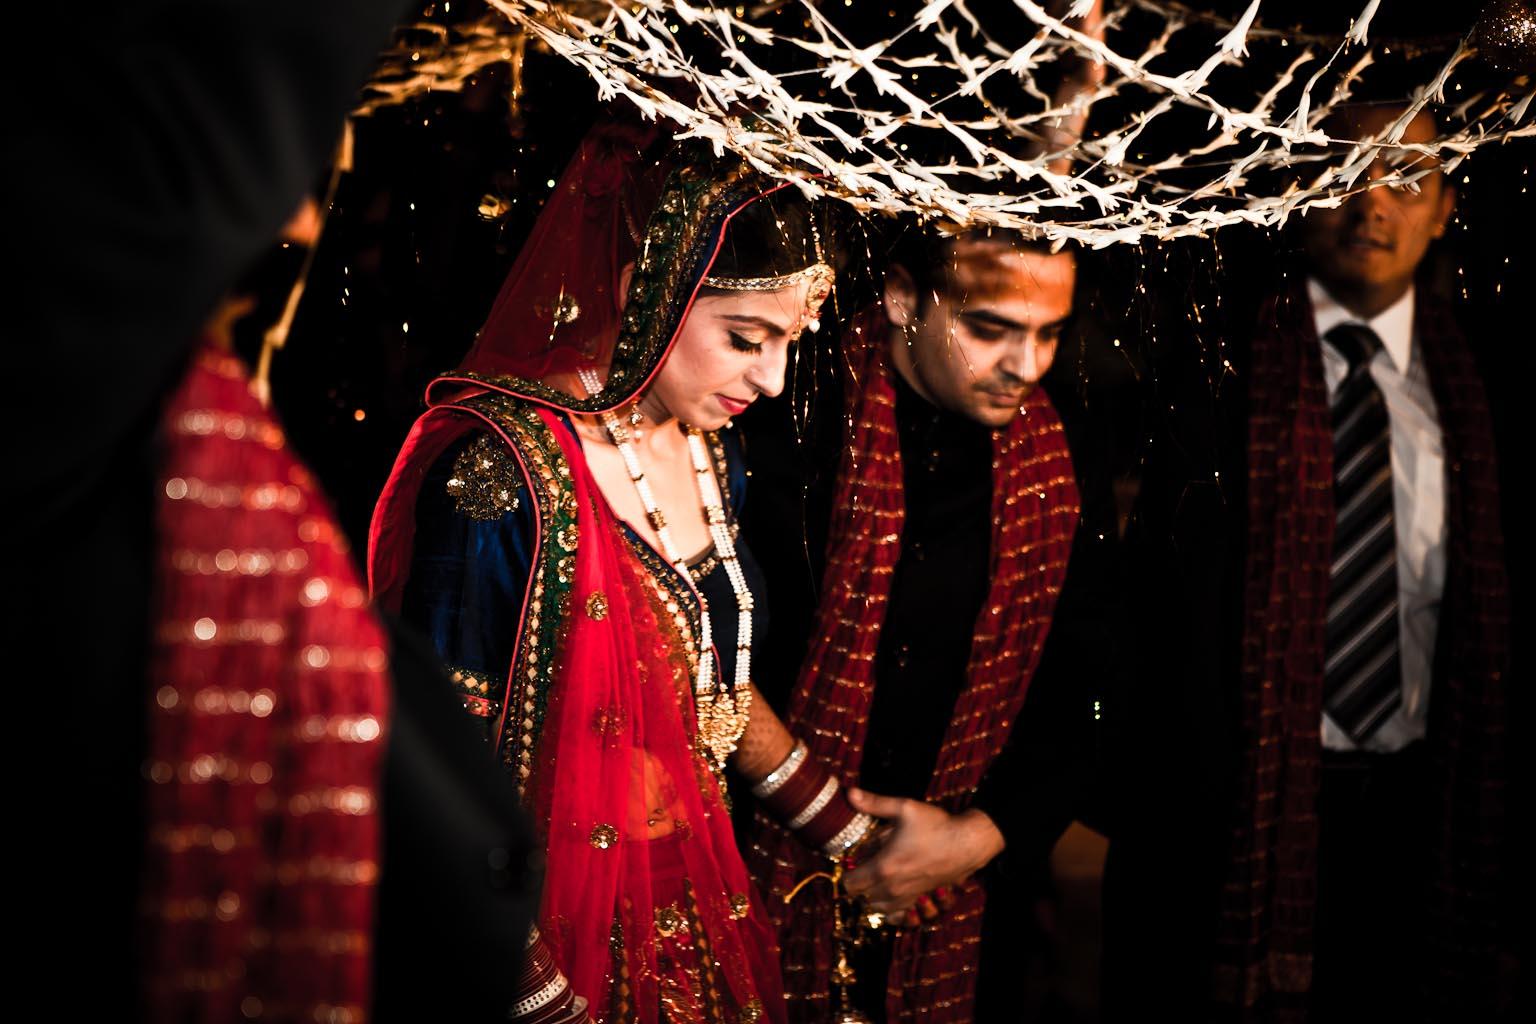 Bride Entrance - Delhi Goregaon Indian wedding - Chhavi Saurabh - Rahul Rana Photography